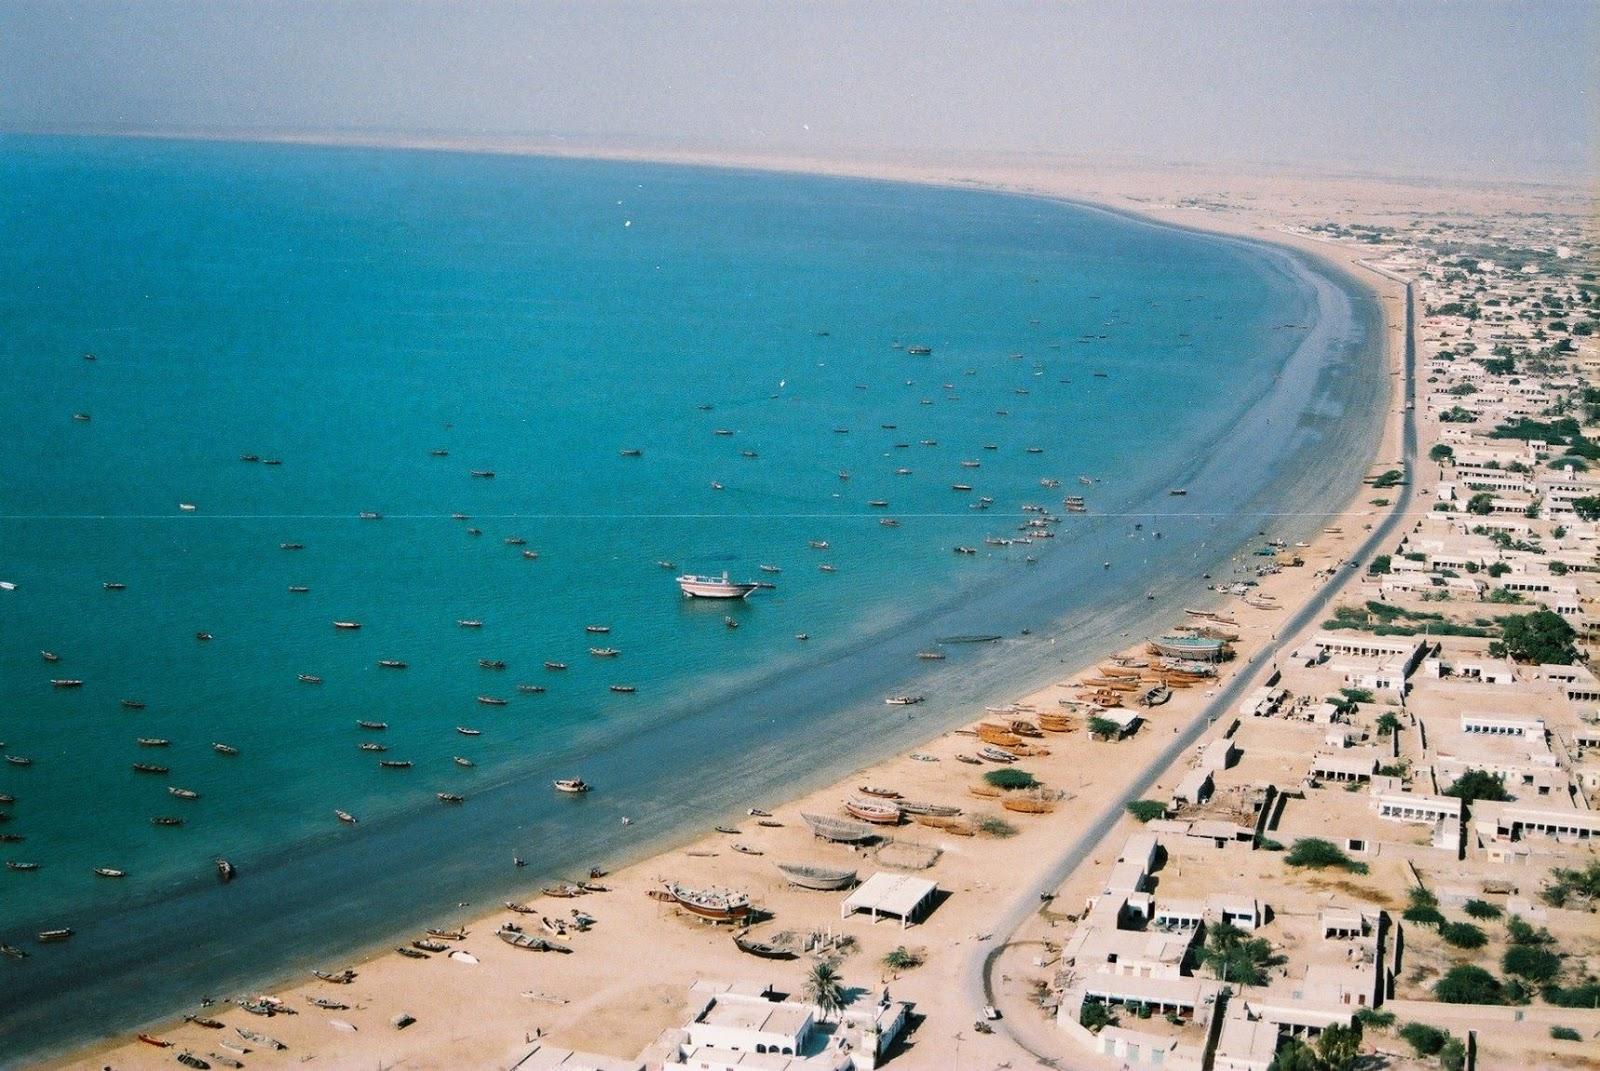 5 Marla Plot File For Sale In Gwadar Golf City